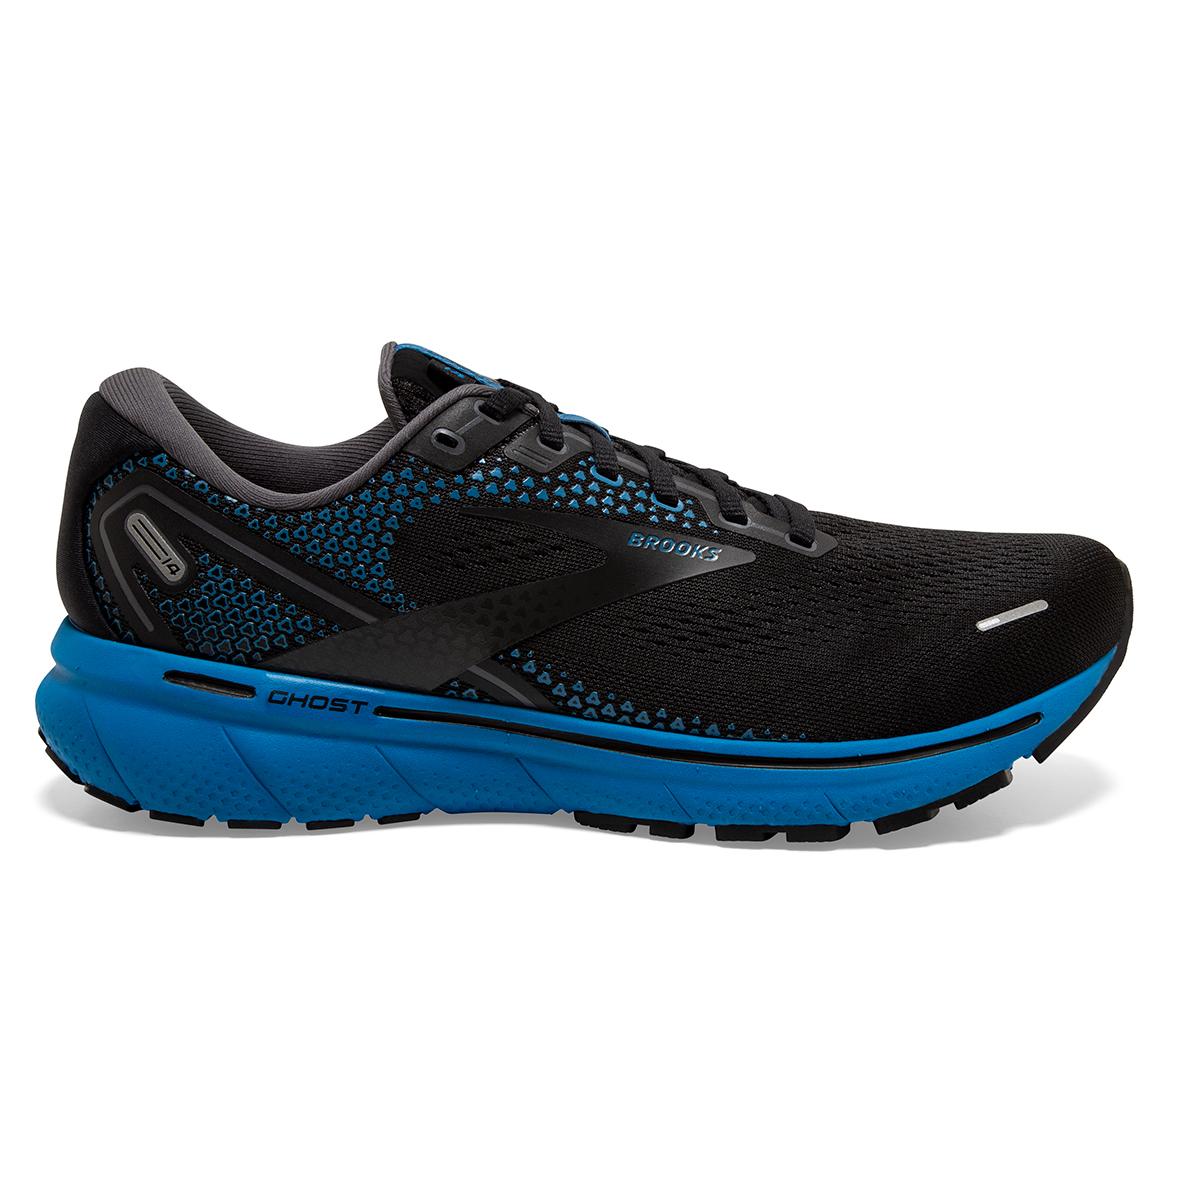 Men's Brooks Ghost 14 Running Shoe - Color: Black/Blackened - Size: 7 - Width: Regular, Black/Blackened, large, image 1